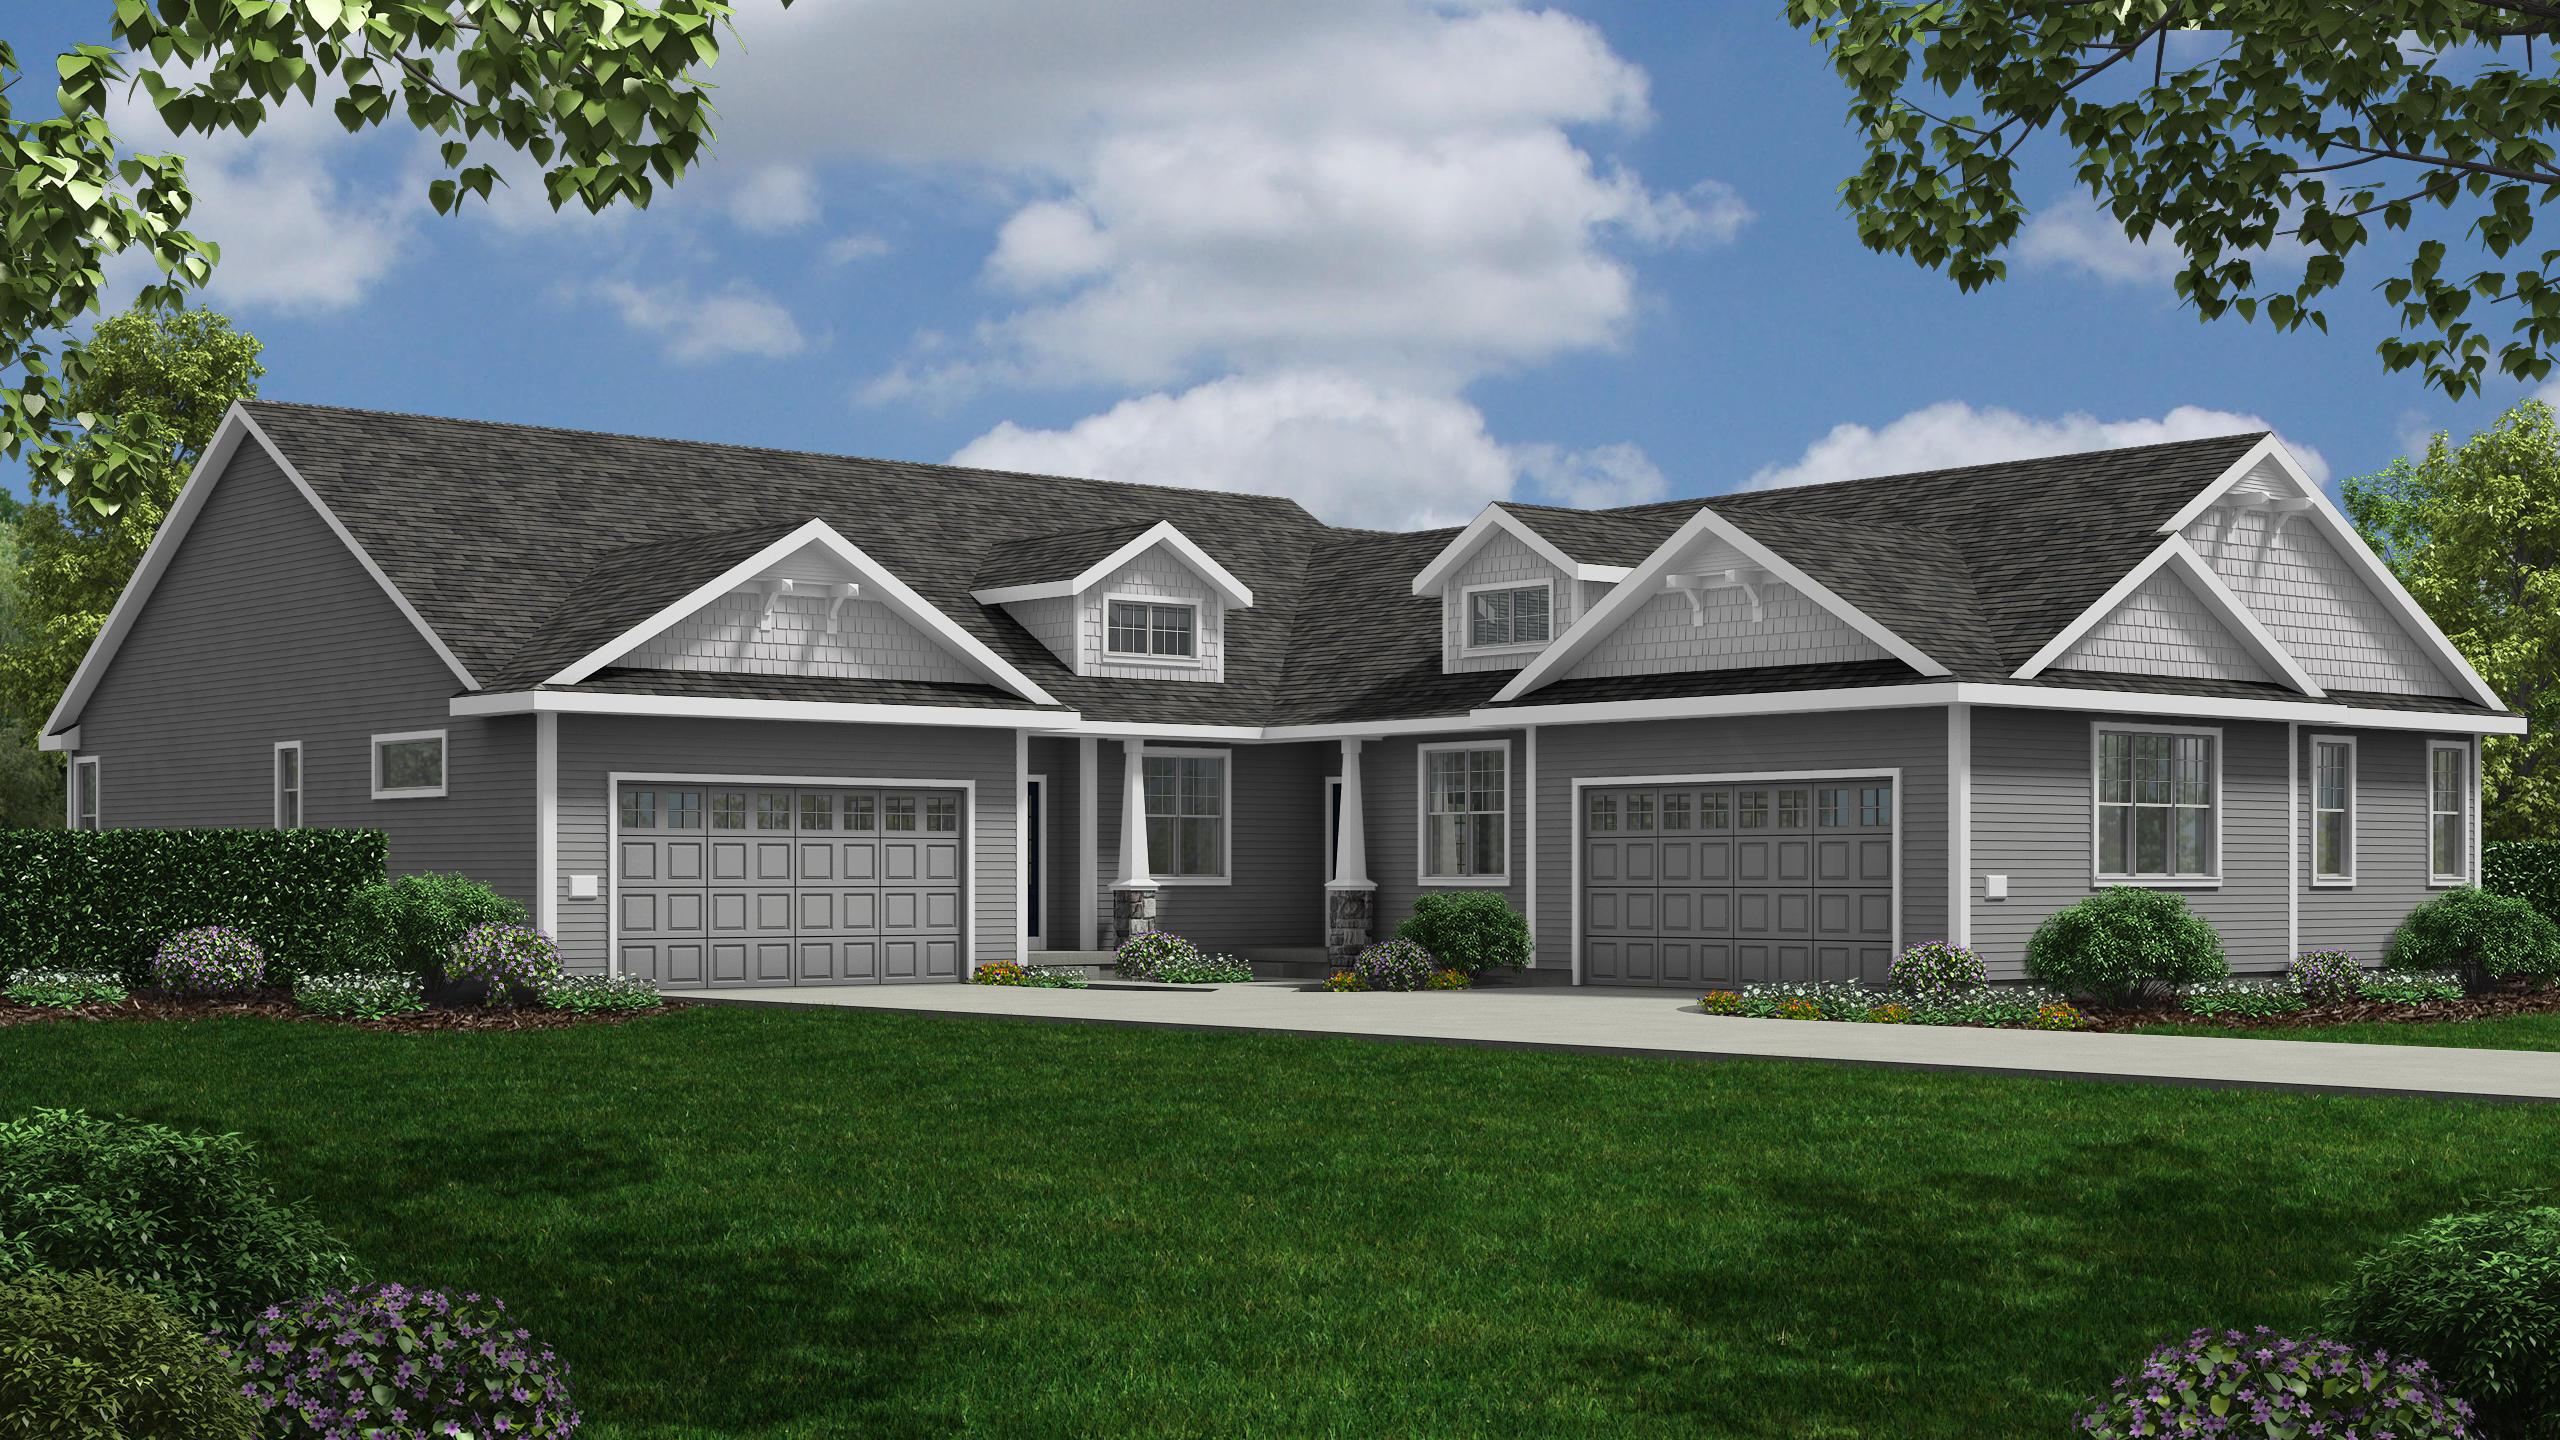 N62W21656 Augusta Pkwy Menomonee Falls, WI 53051 Property Image